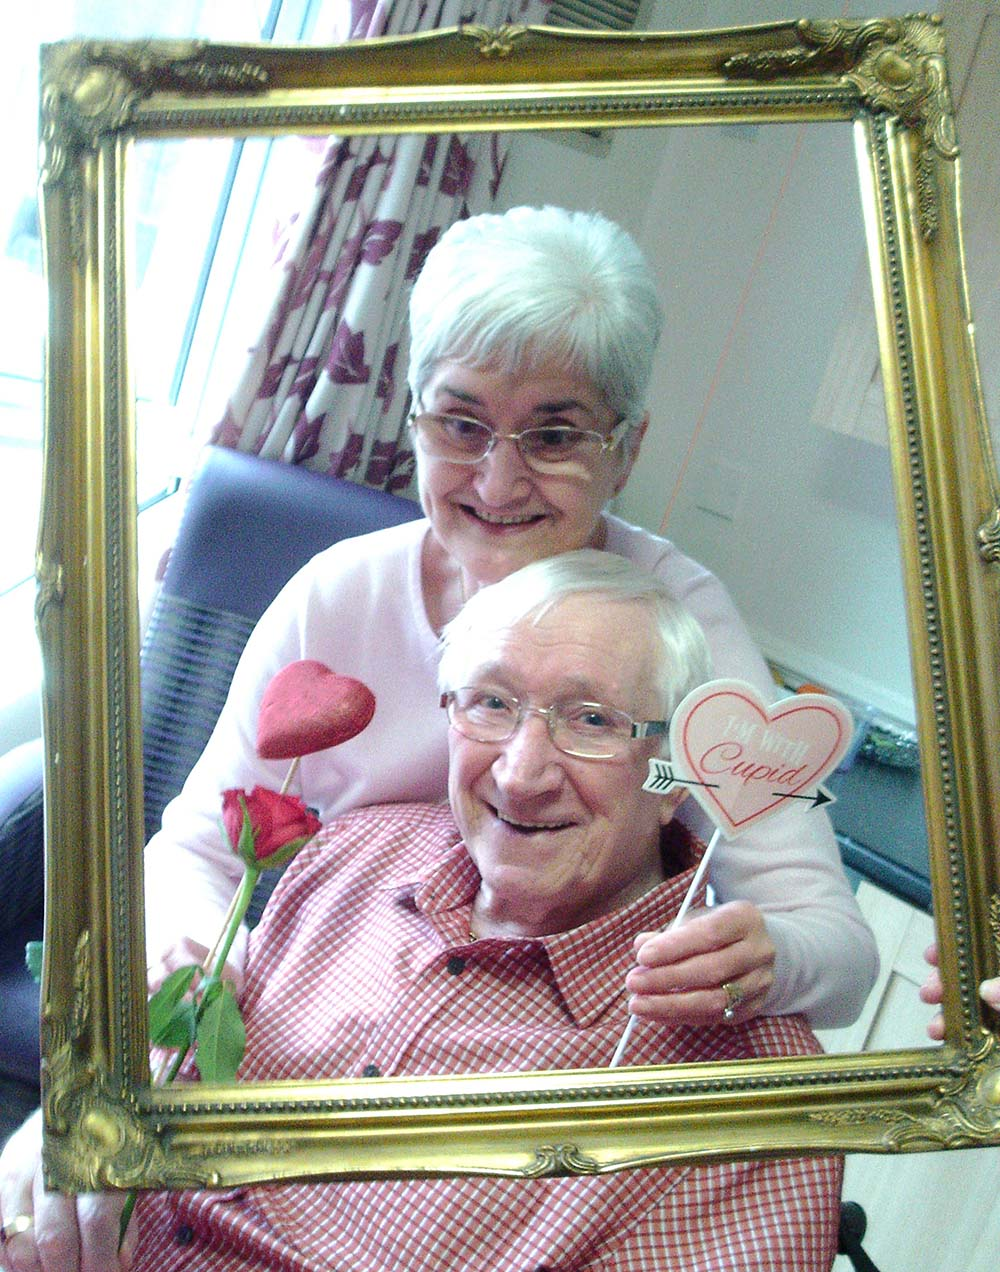 Valentine's Day at Defoe Care Home